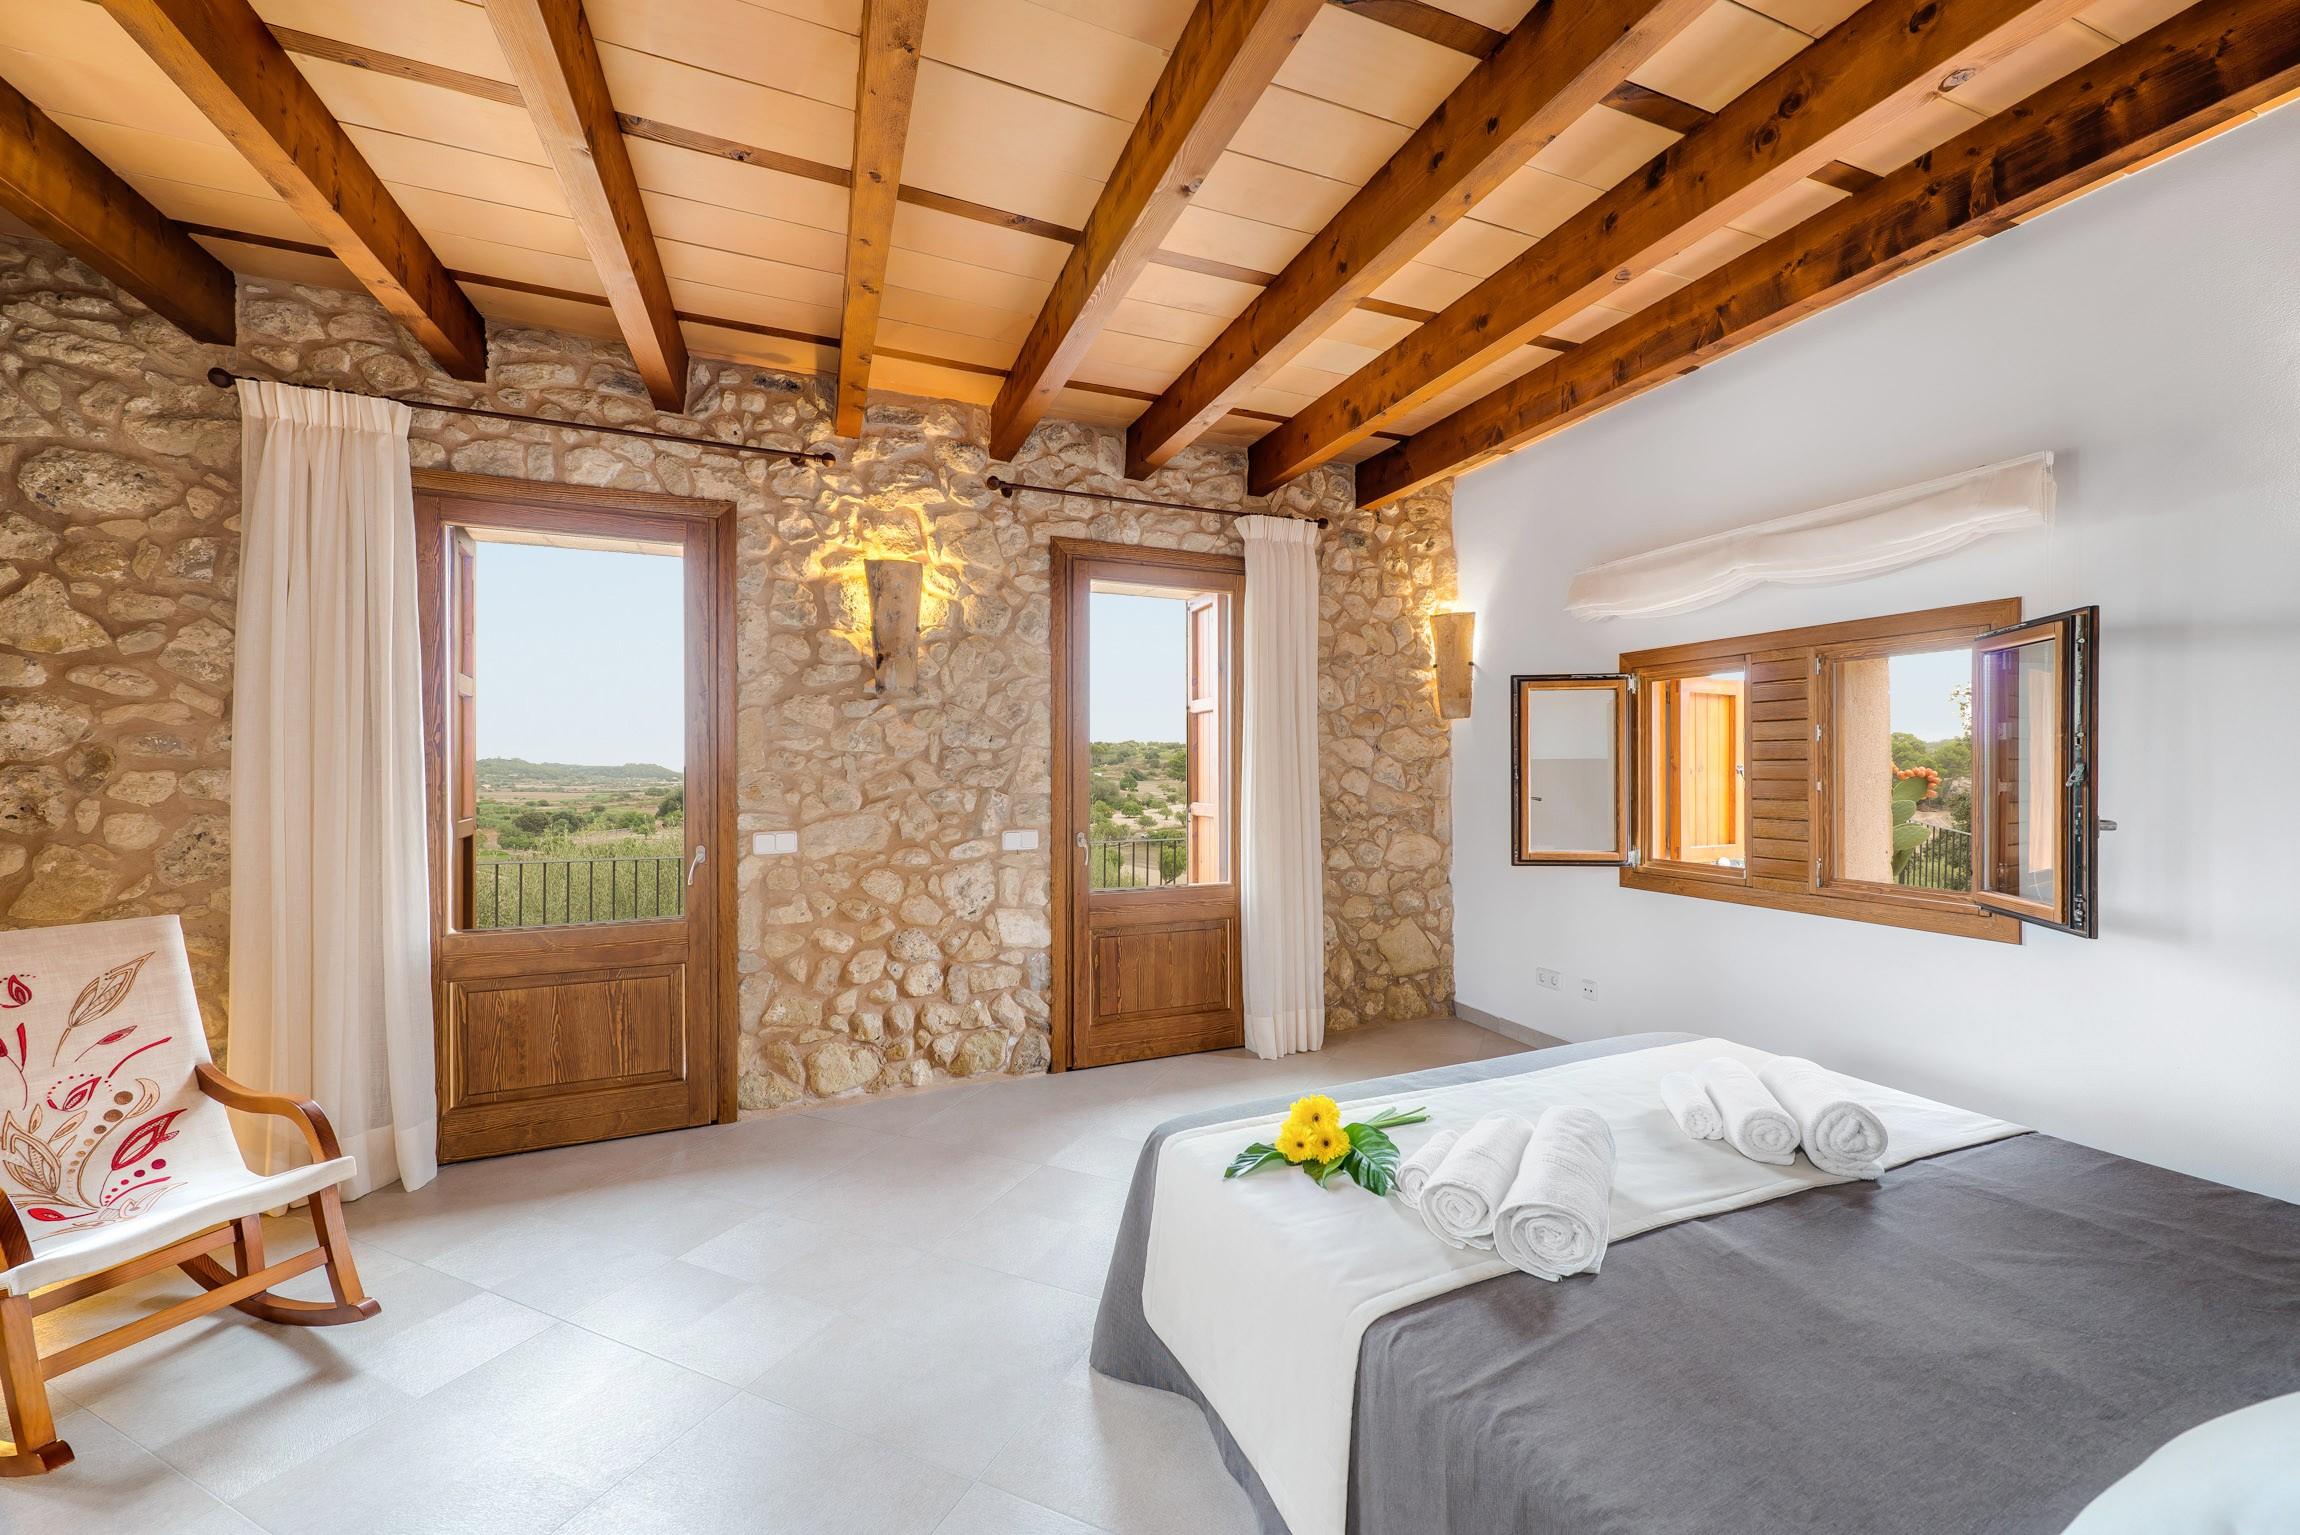 Ferienhaus SON DAVIU (1859500), Petra (ES), Mallorca, Balearische Inseln, Spanien, Bild 13